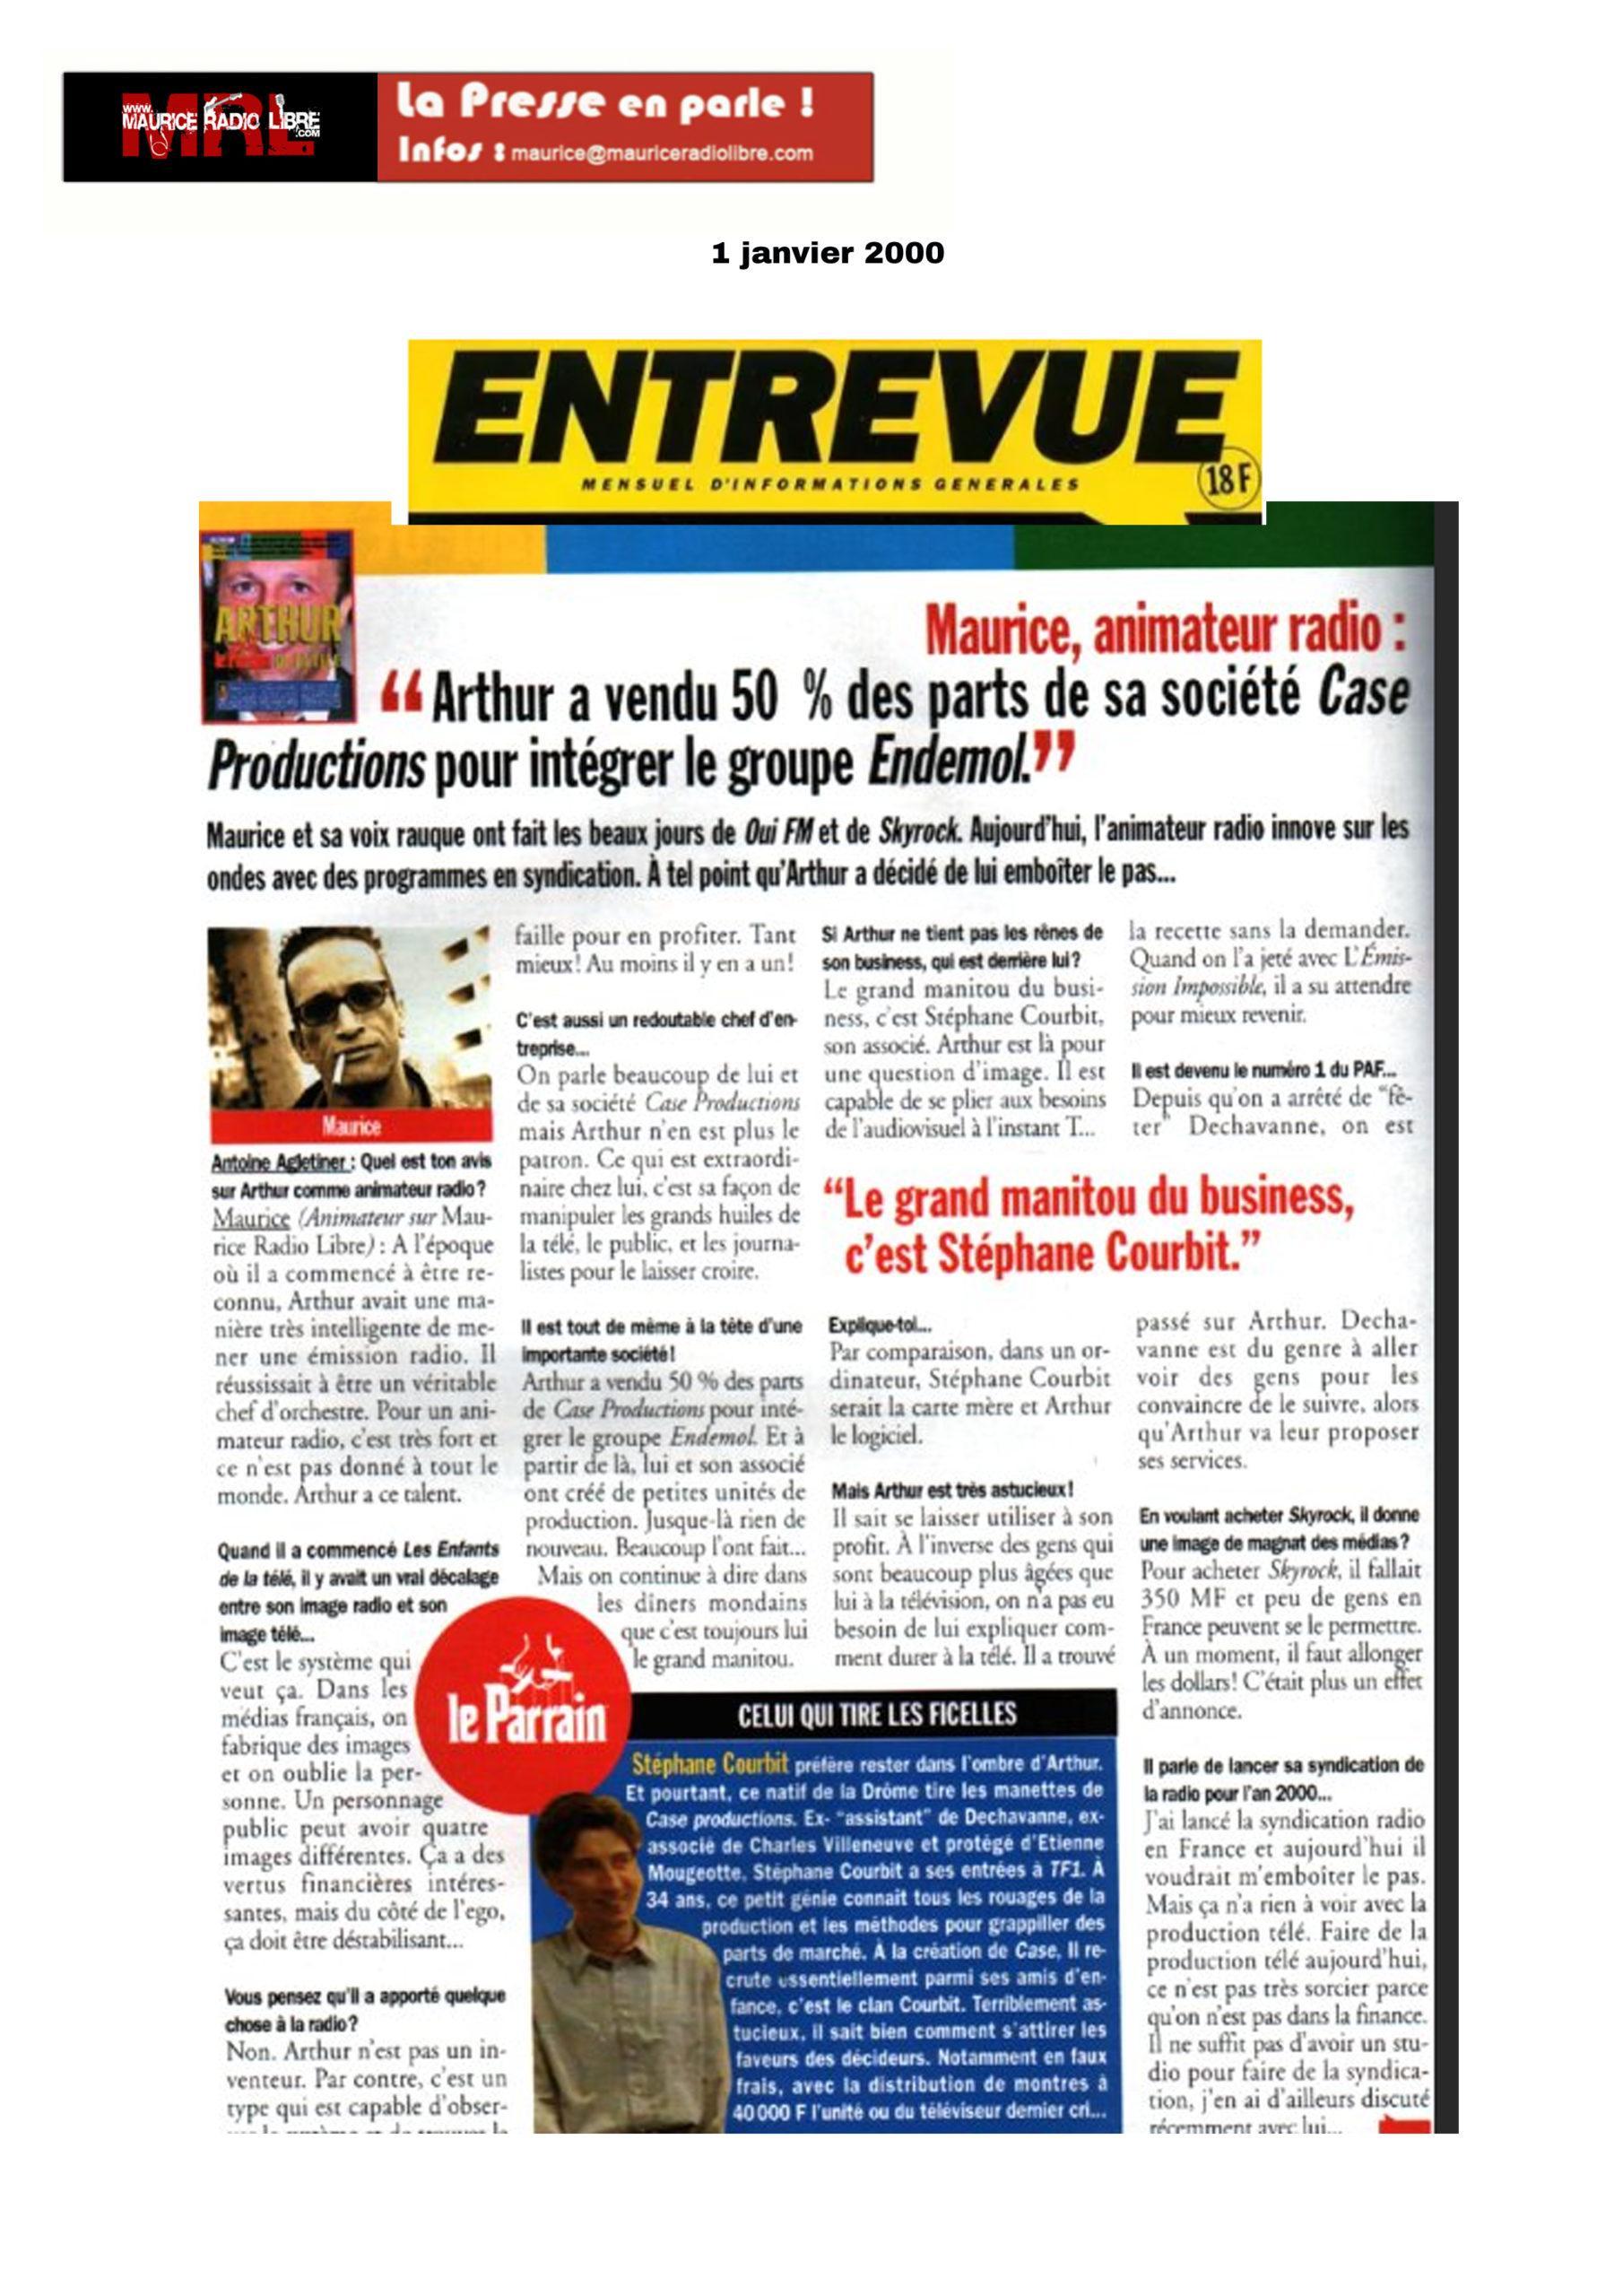 vignette Entrevue Maurice, animateur Radio - 01/01/2000